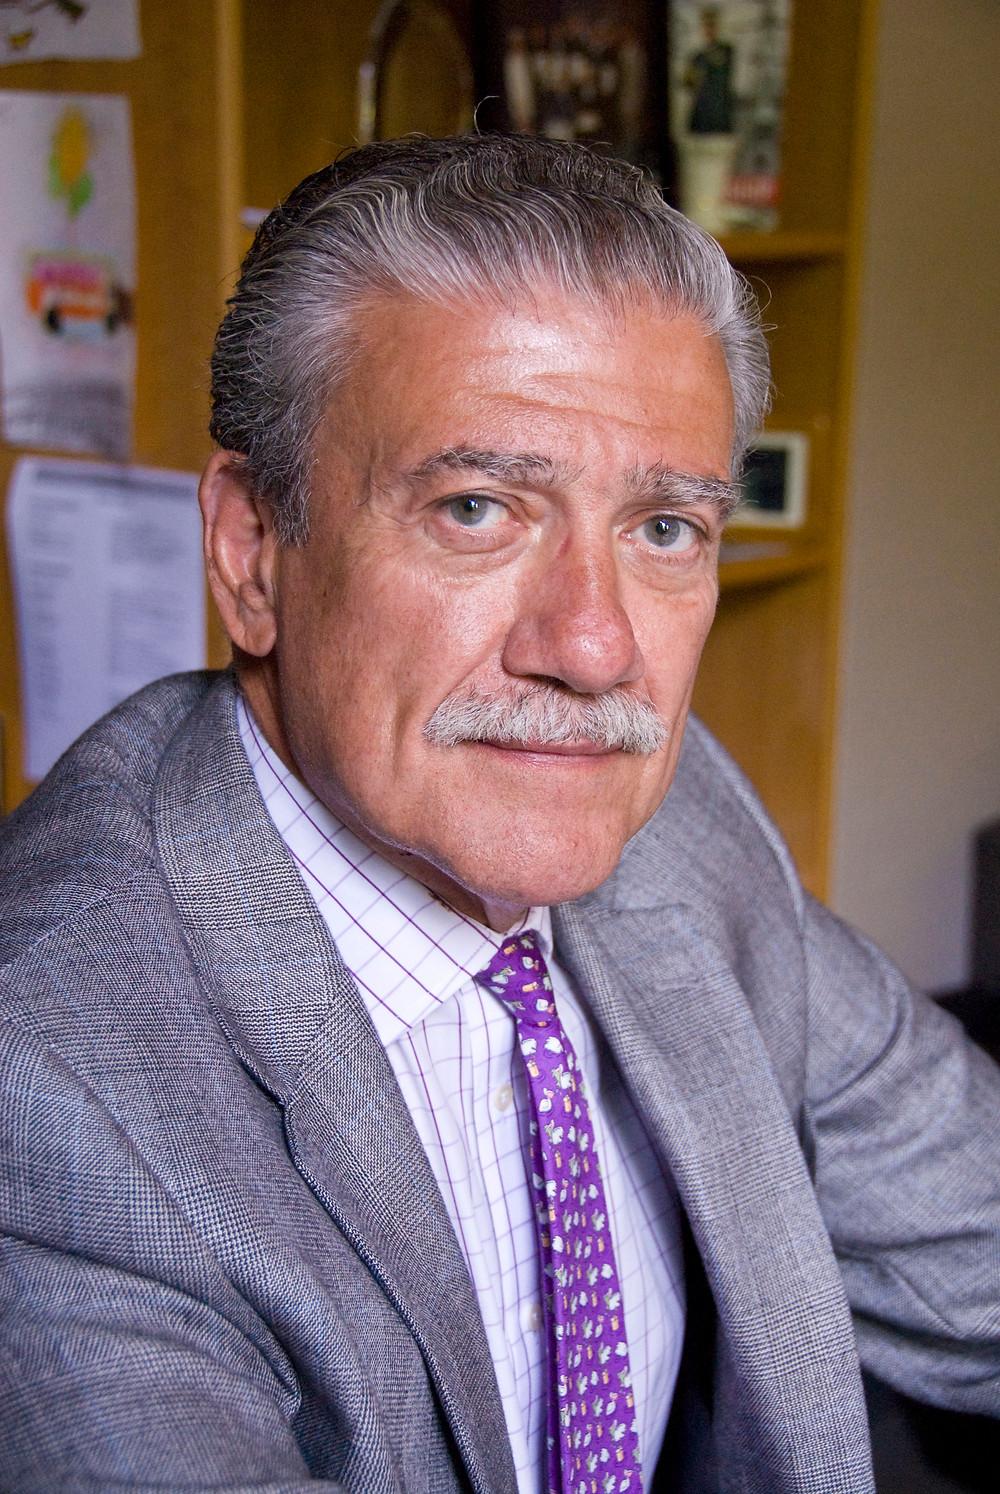 Headshot of John Kemp, president and CEO of the Viscardi Center